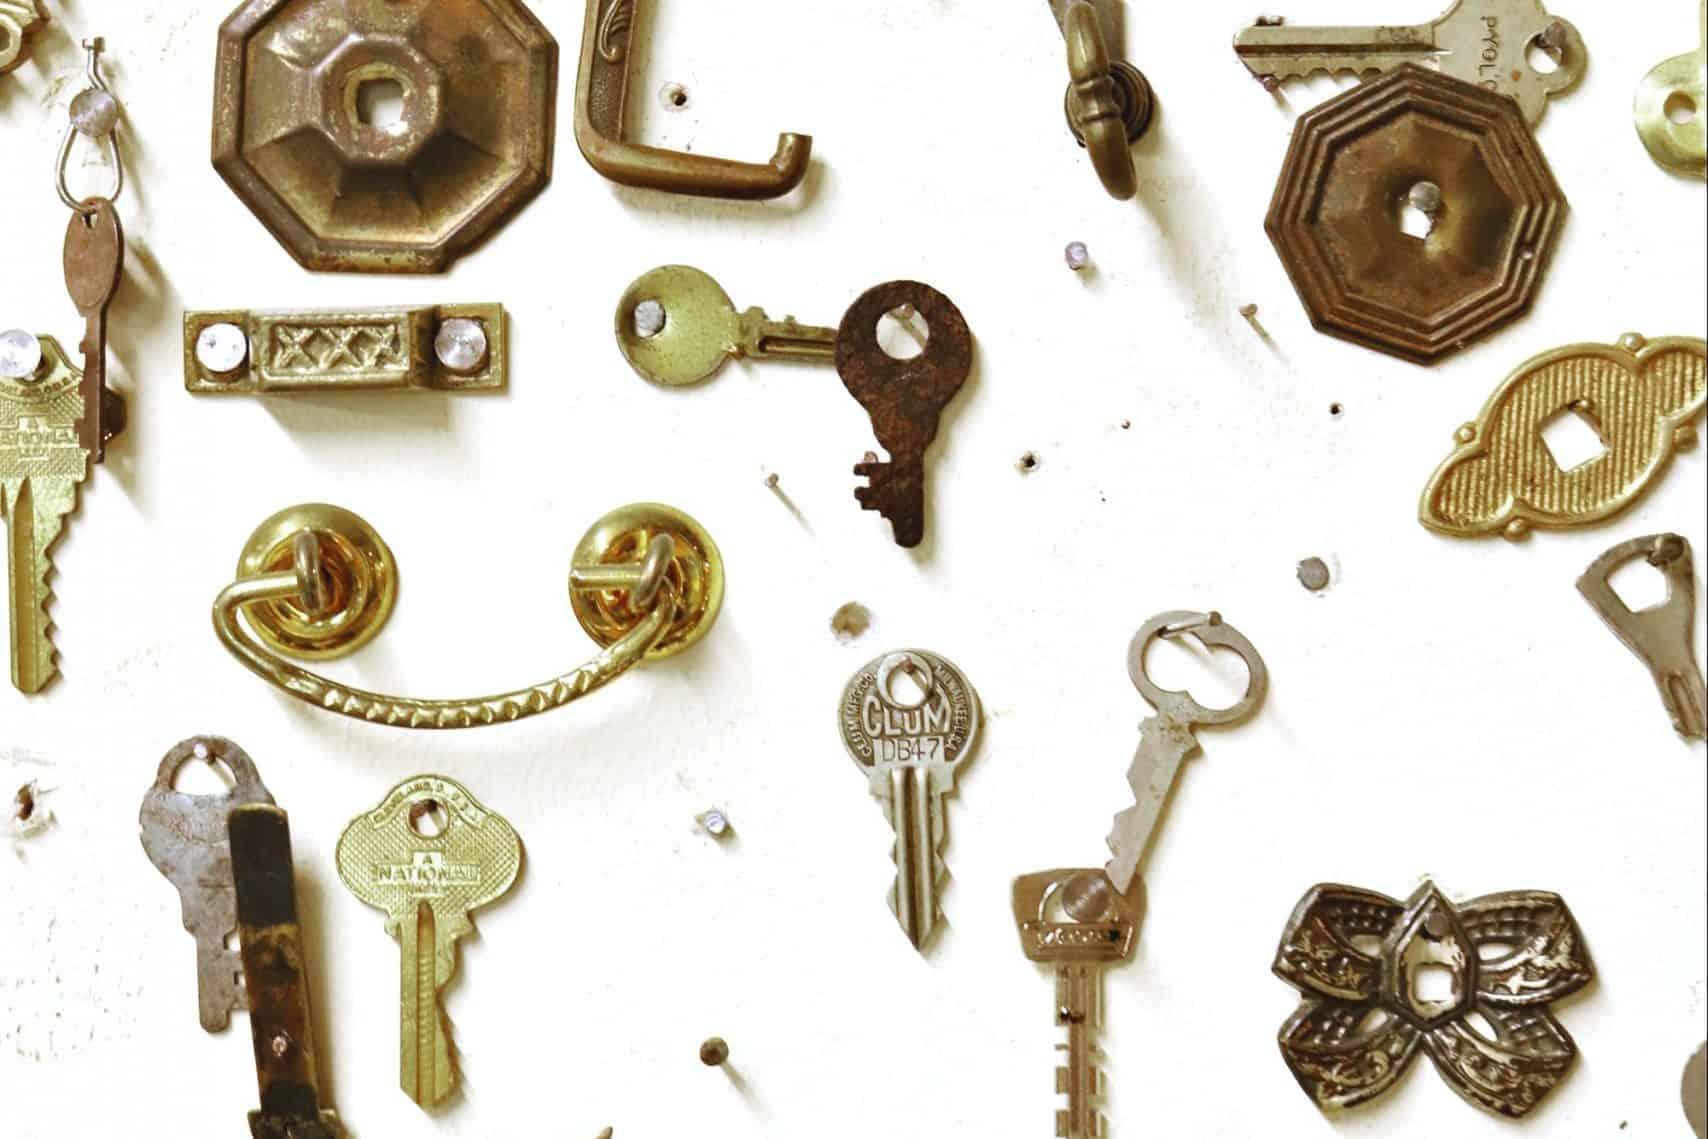 keys representing enneatype resources